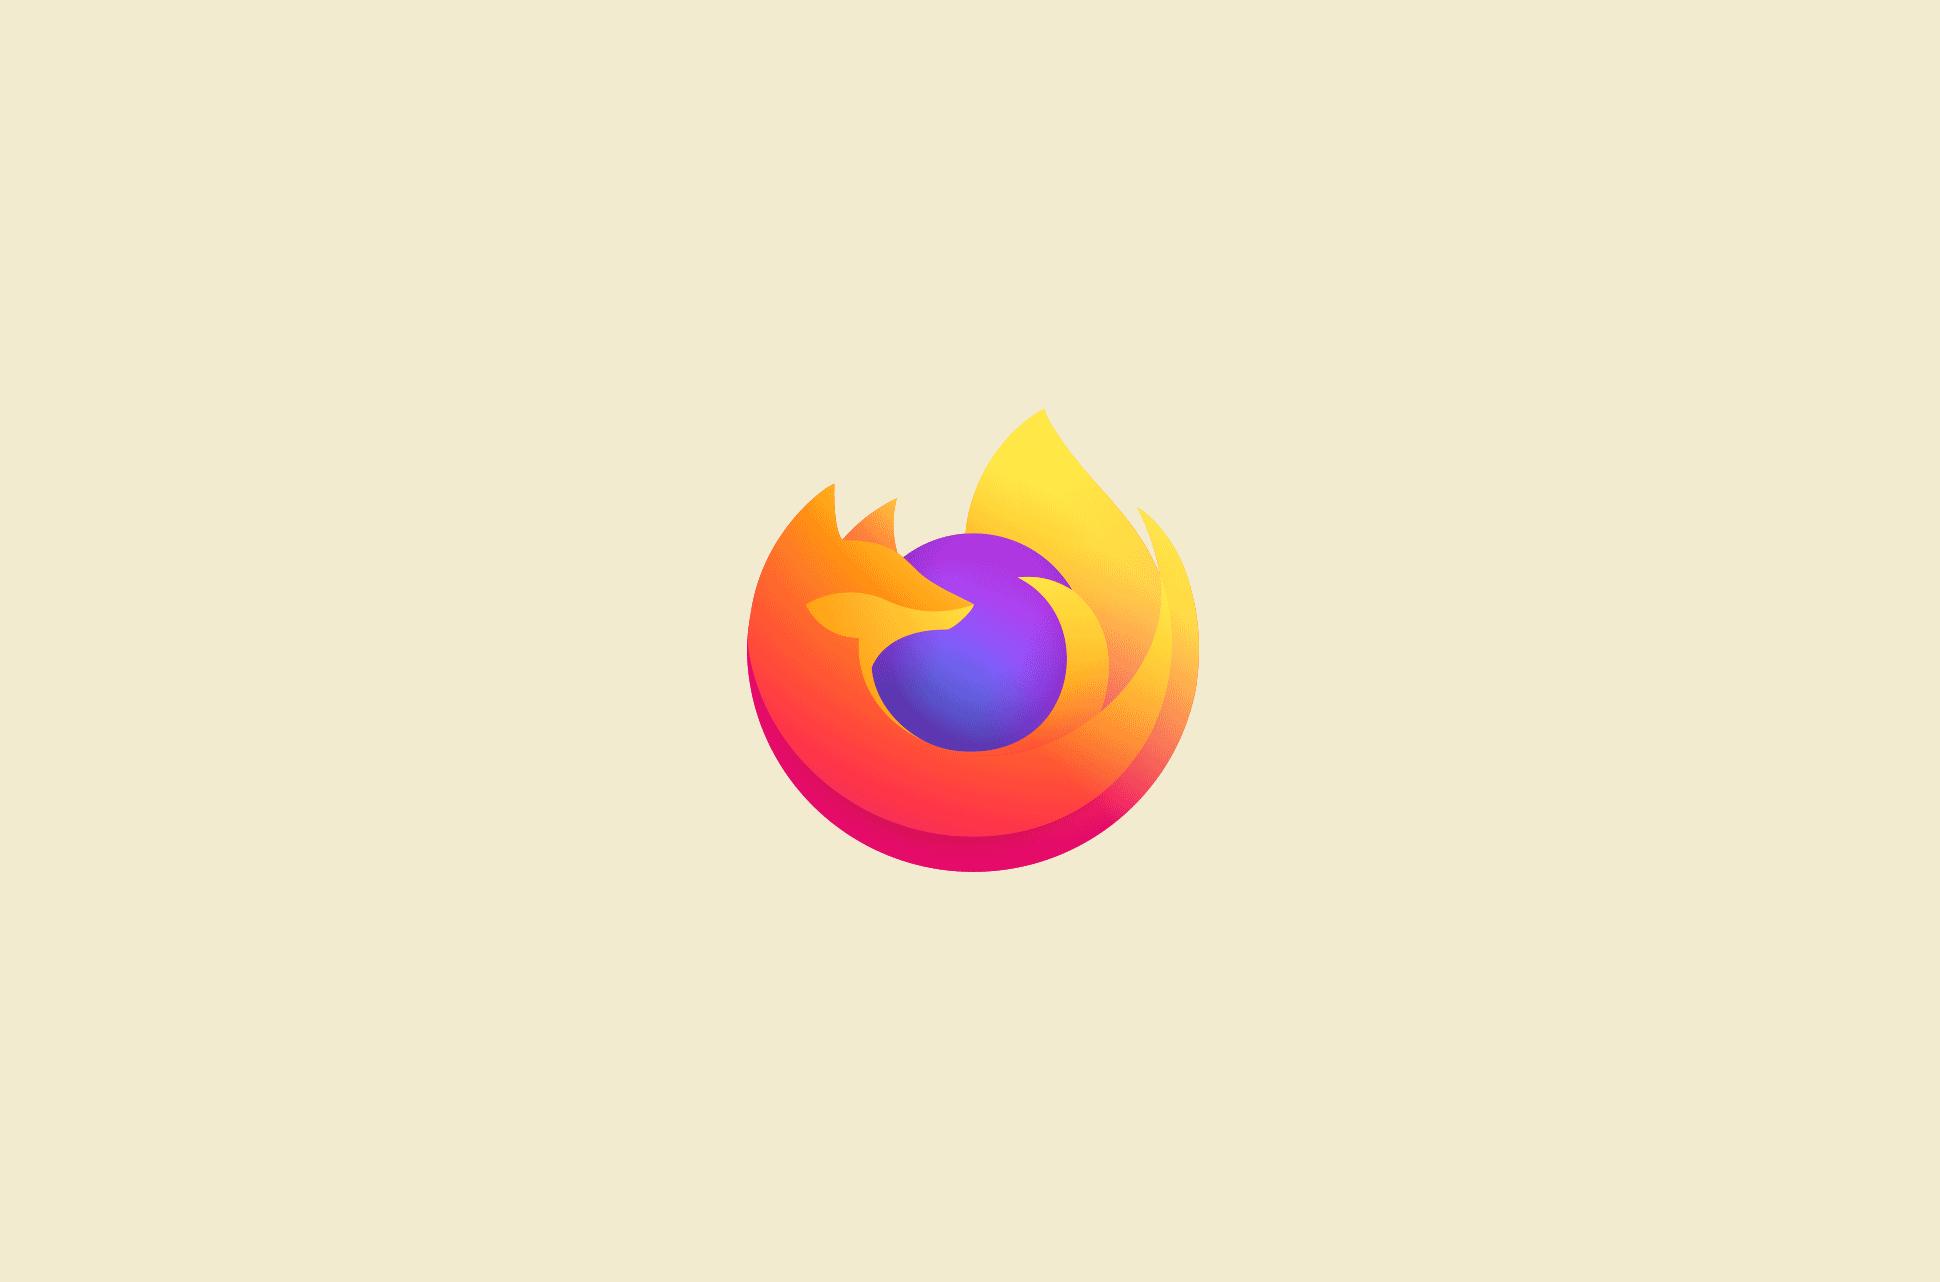 FireFox browser logo.